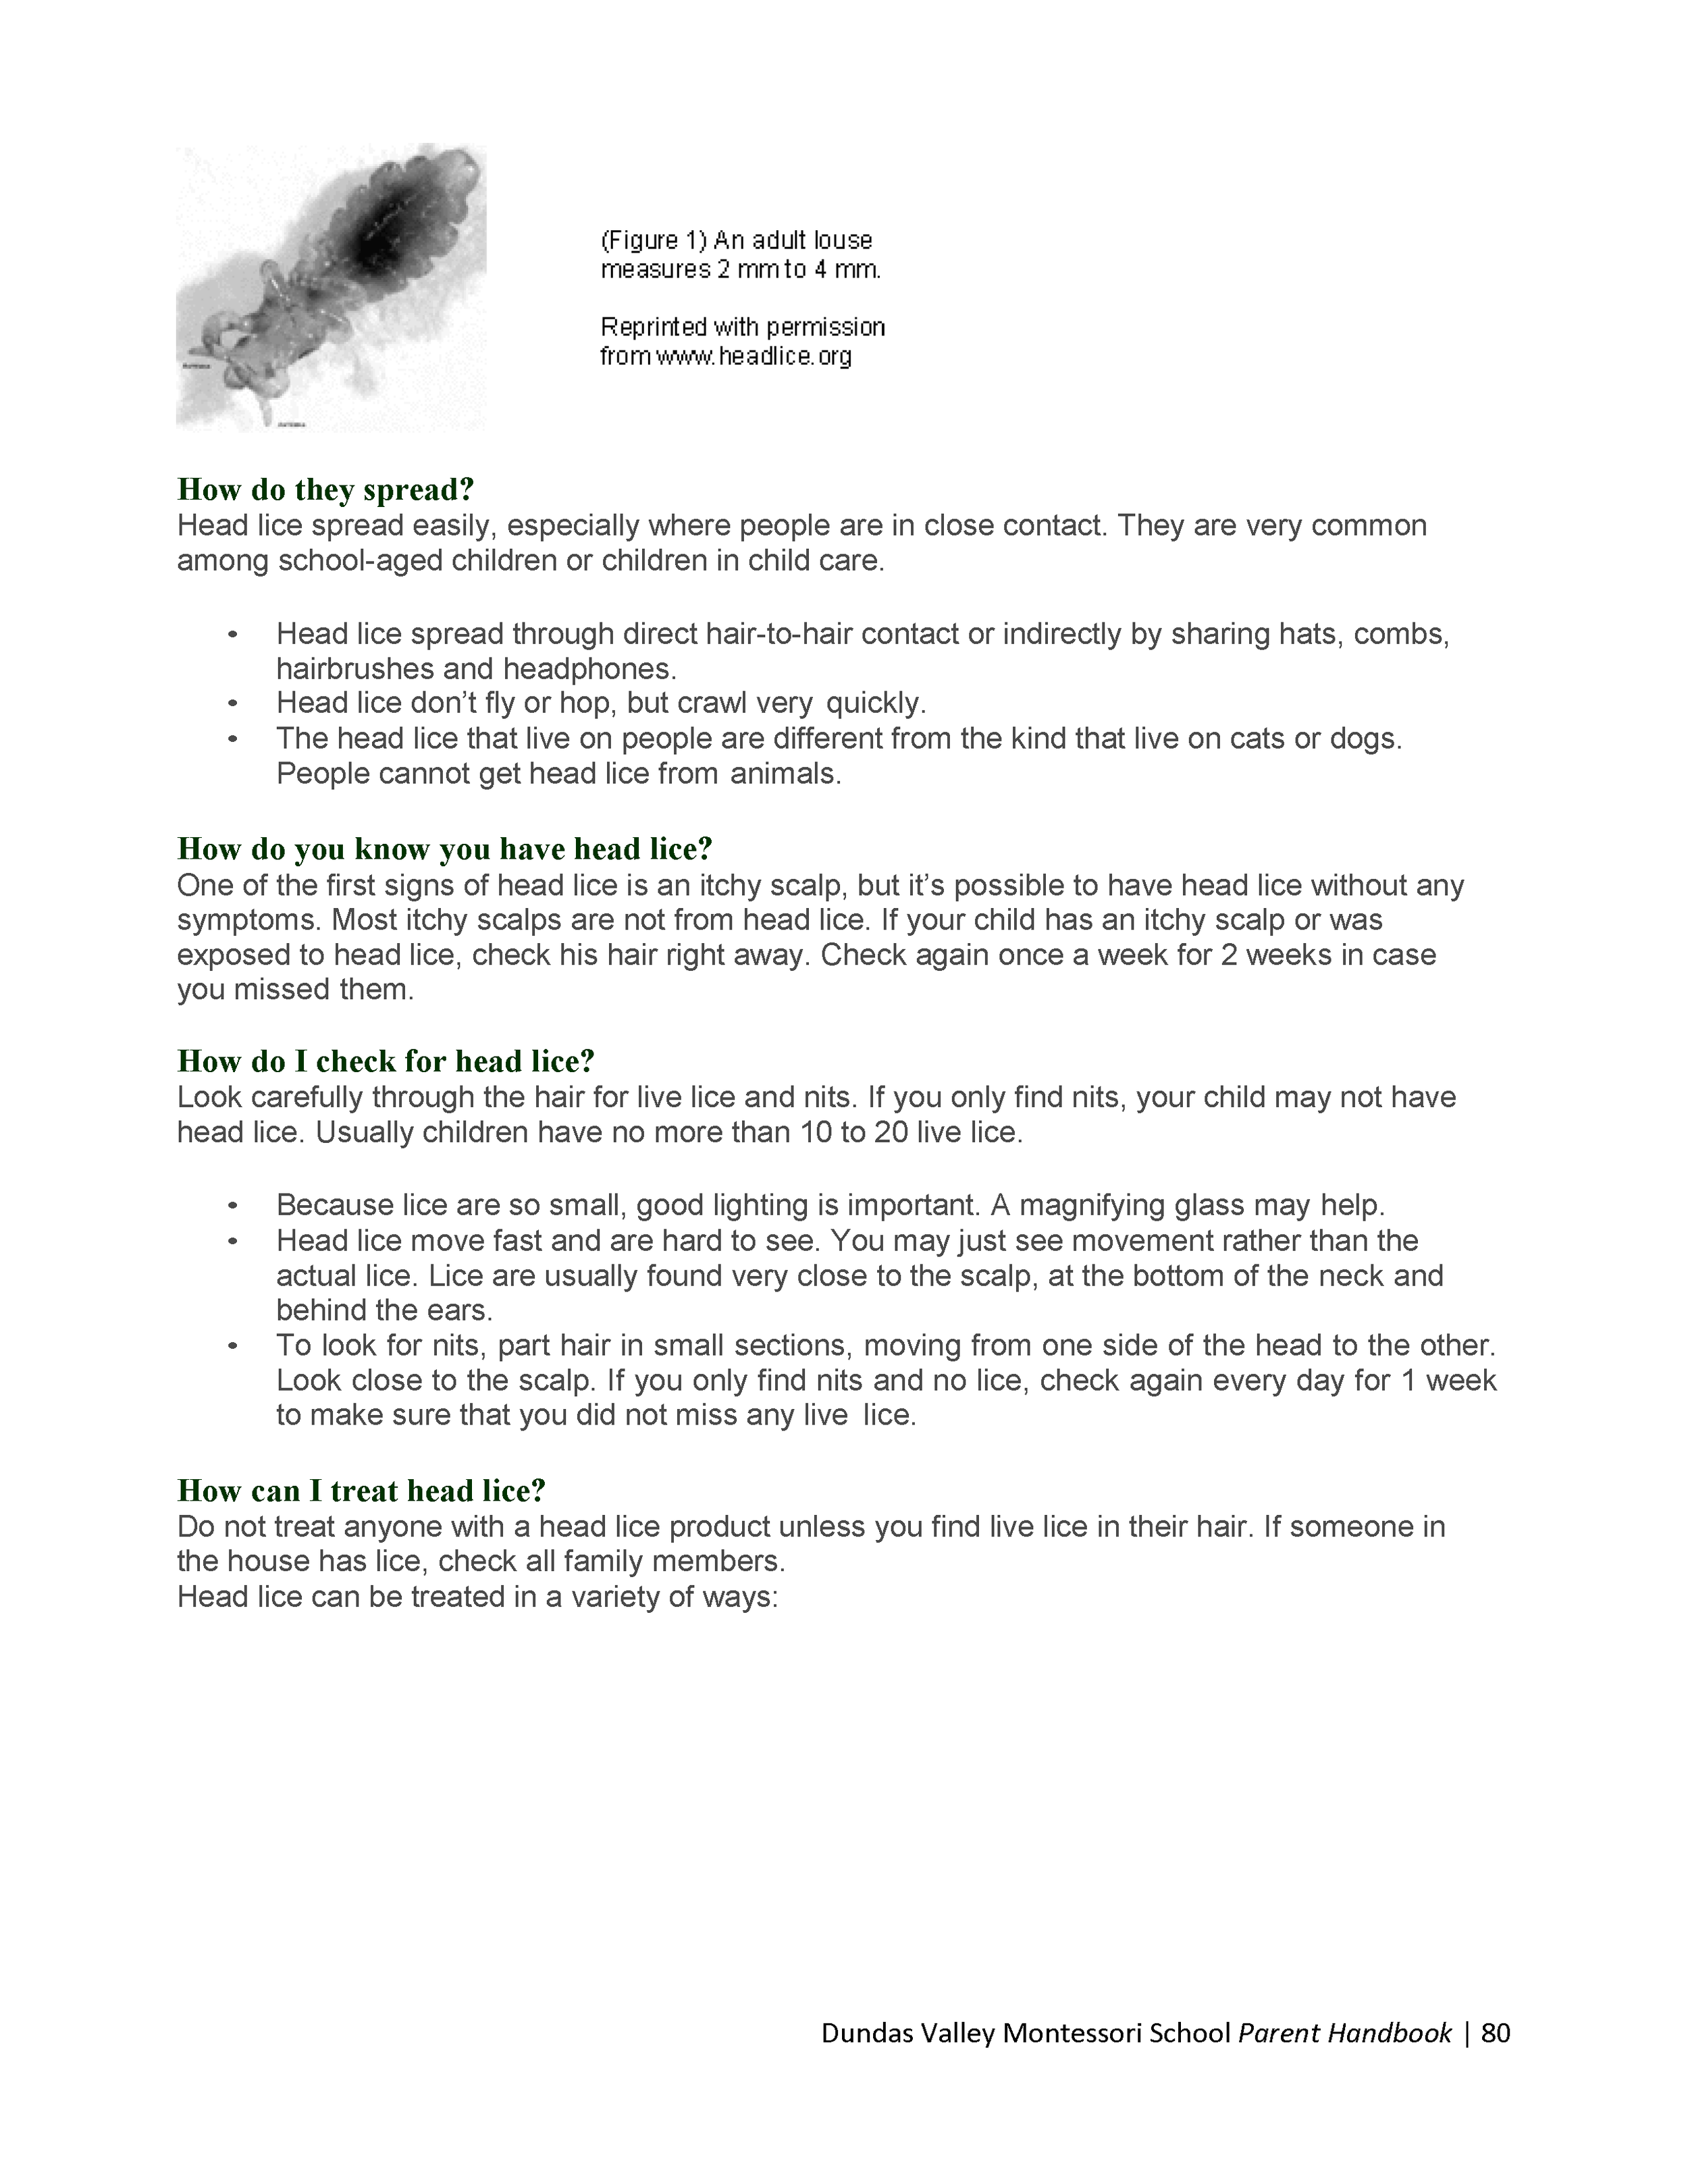 DVMS-Parent-Handbook-19-20_Page_082.png